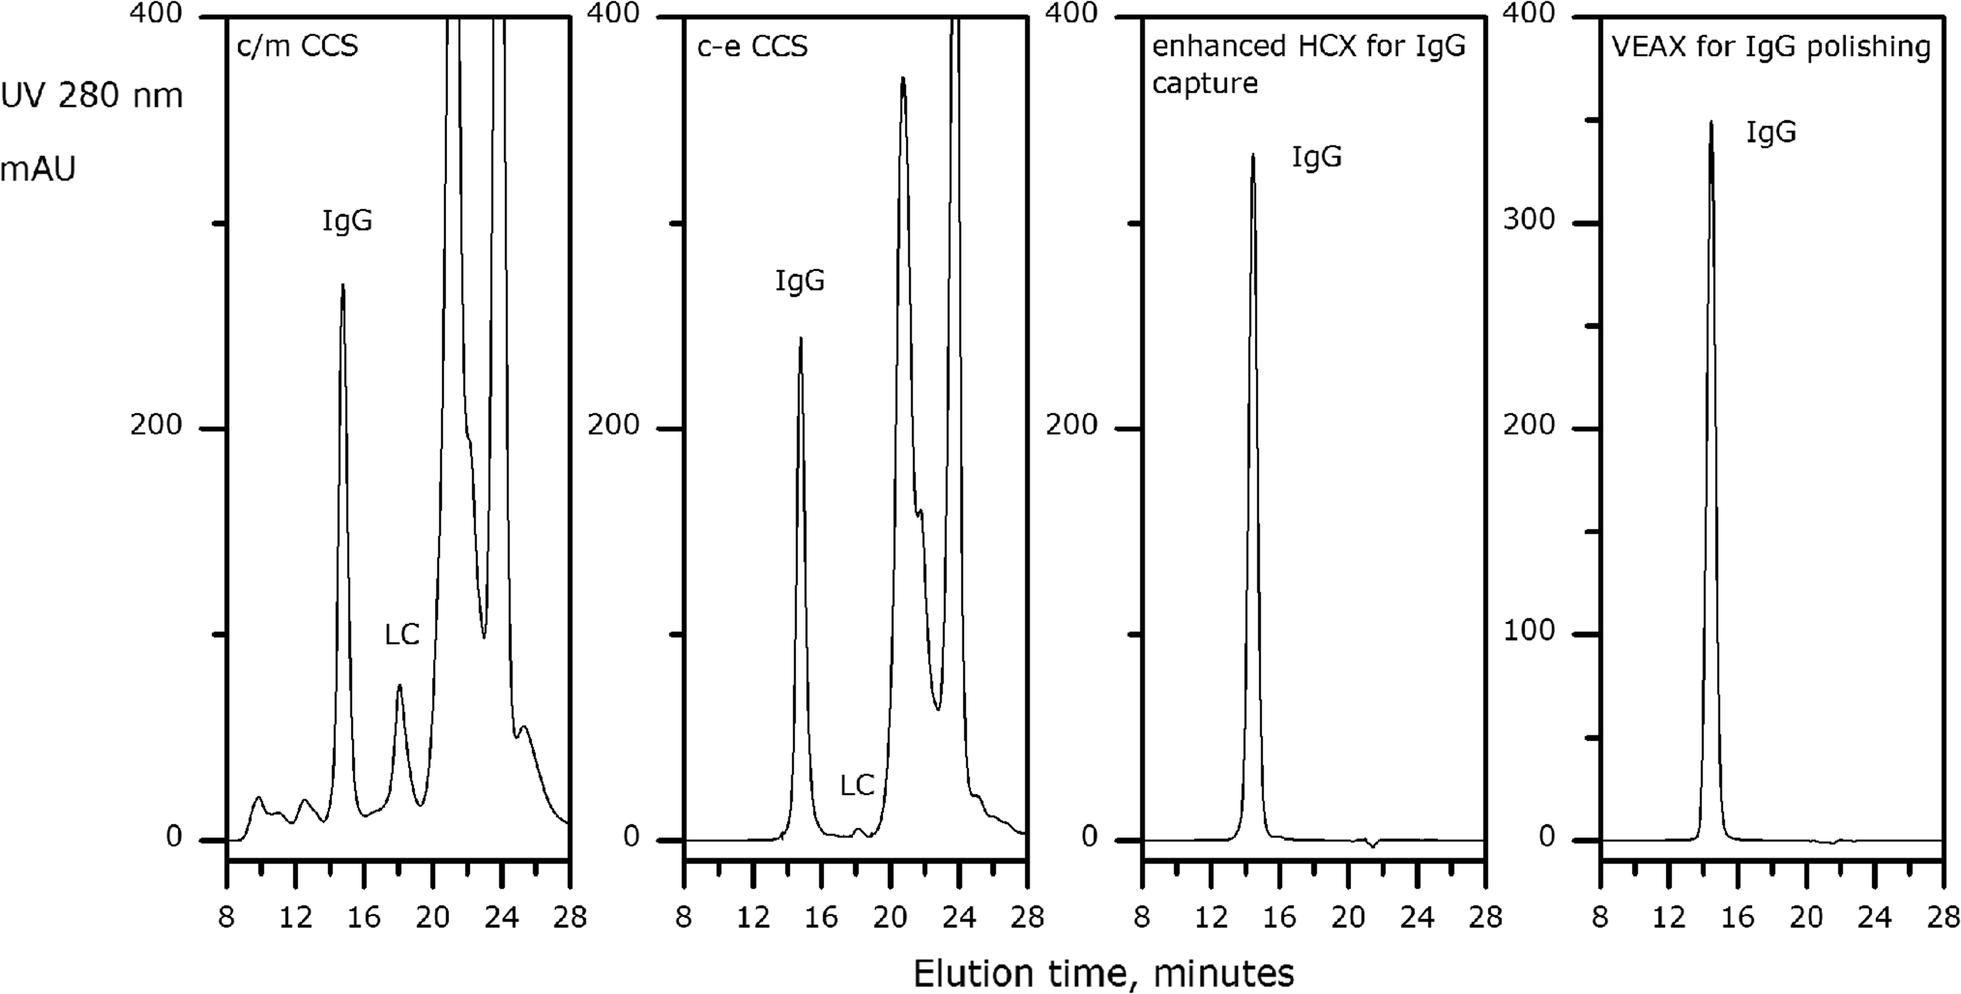 application of enhanced electronegative multimodal chromatography as